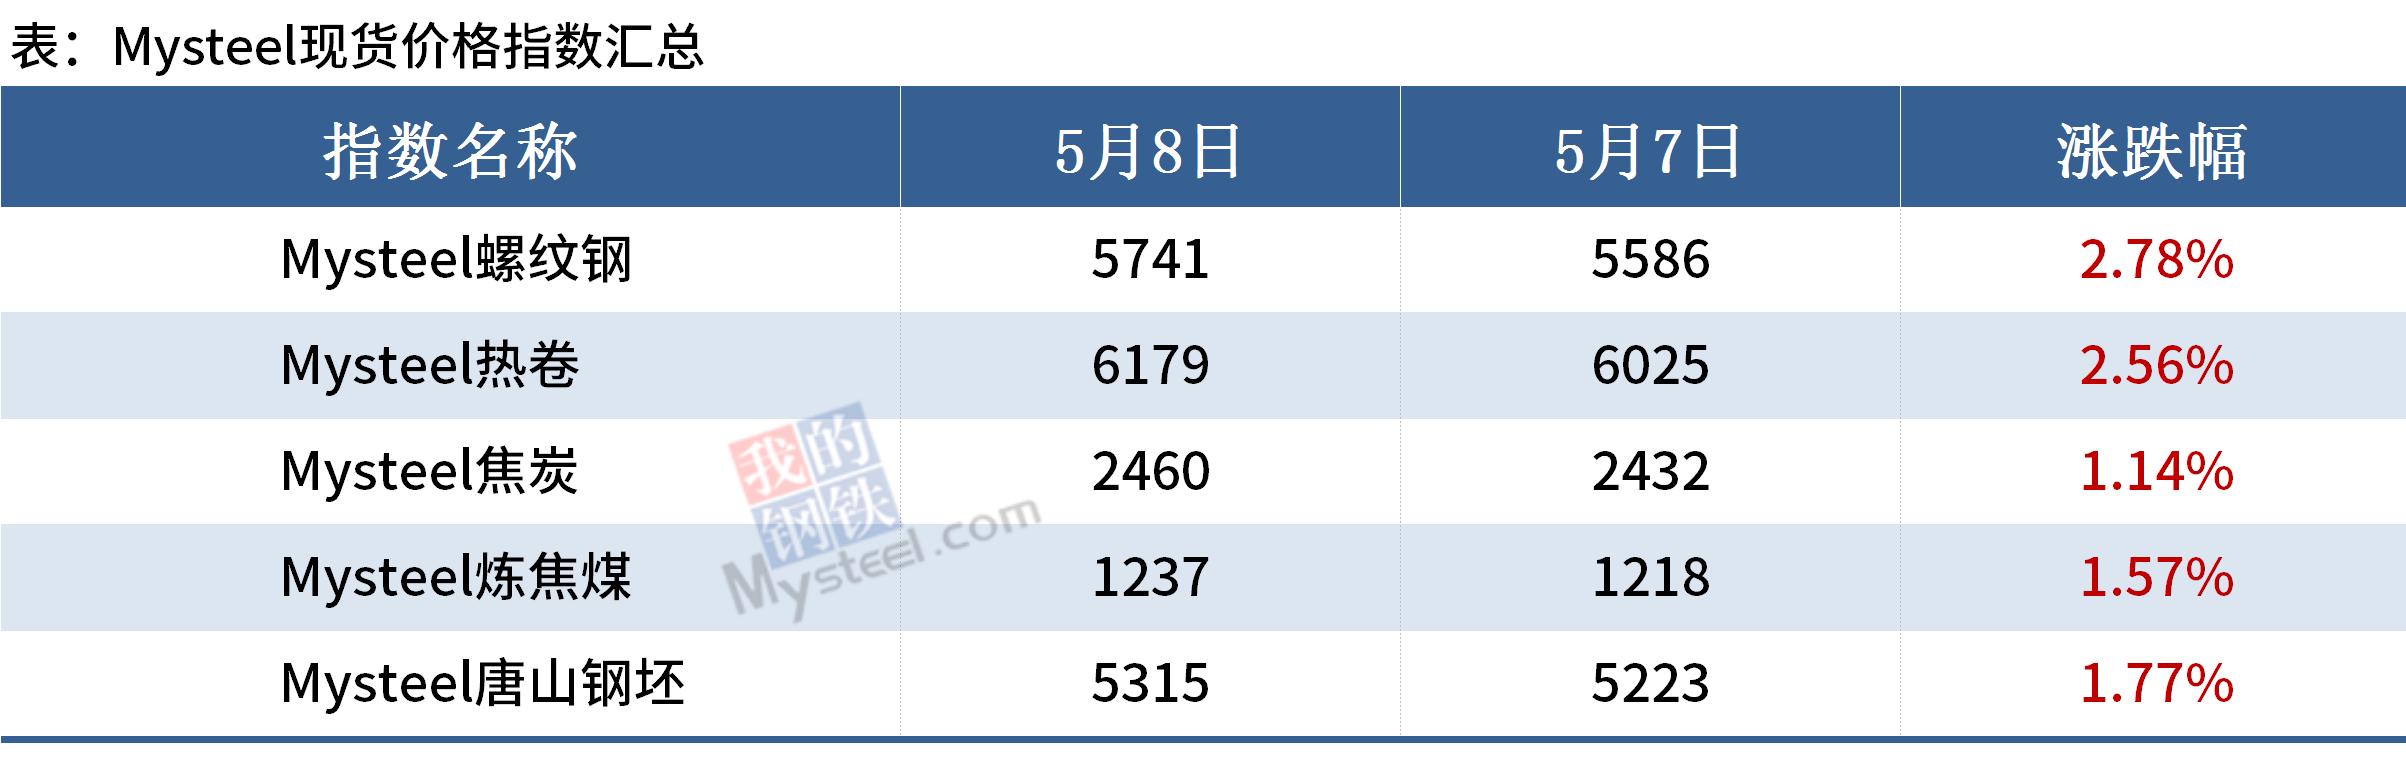 Mysteel晚餐:唐山钢坯累涨130,吨钢利润约1200(图3)